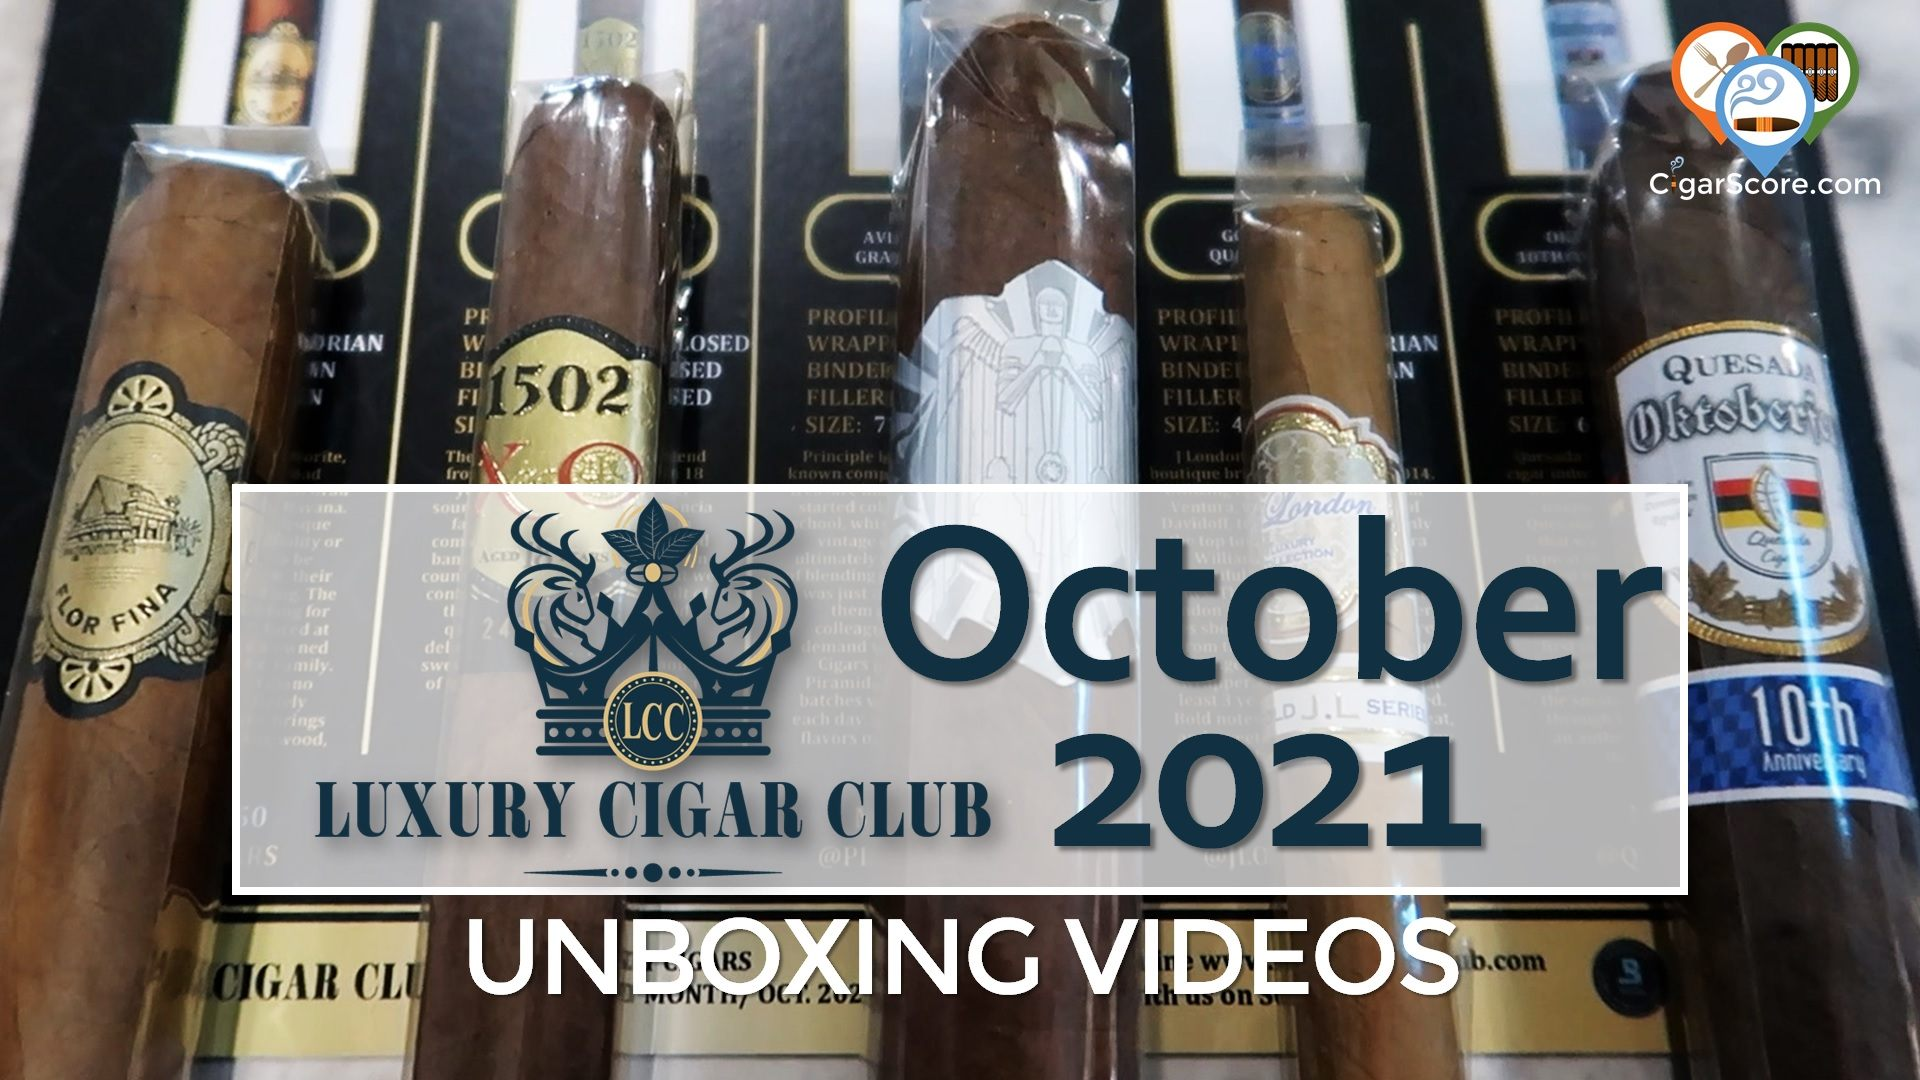 UNBOXING – Luxury Cigar Club OCTOBER 2021